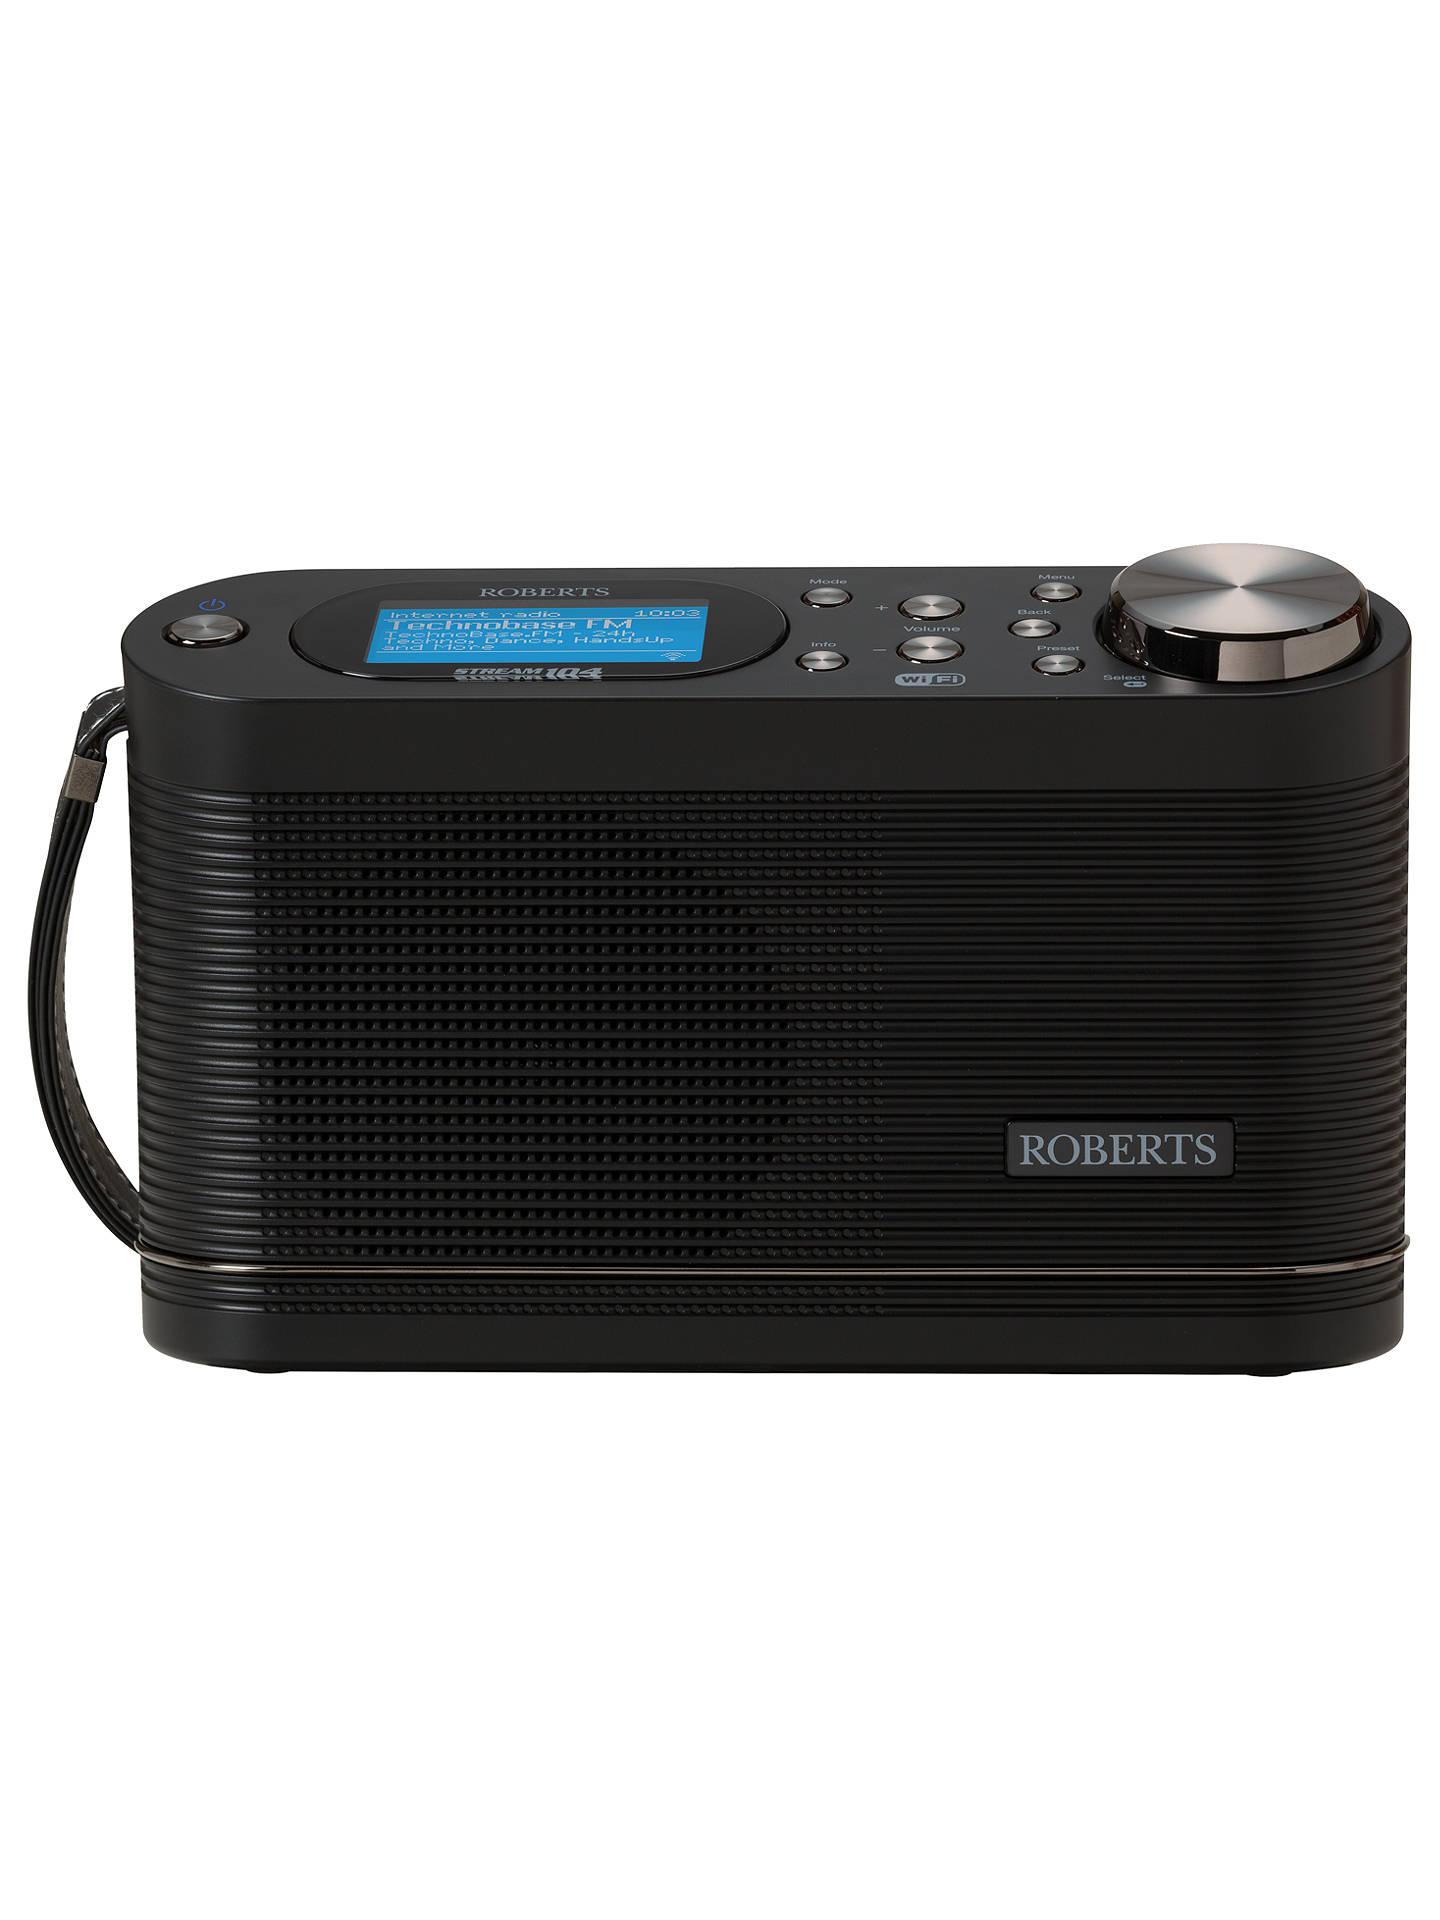 roberts stream 104 smart radio with dab fm internet radio. Black Bedroom Furniture Sets. Home Design Ideas